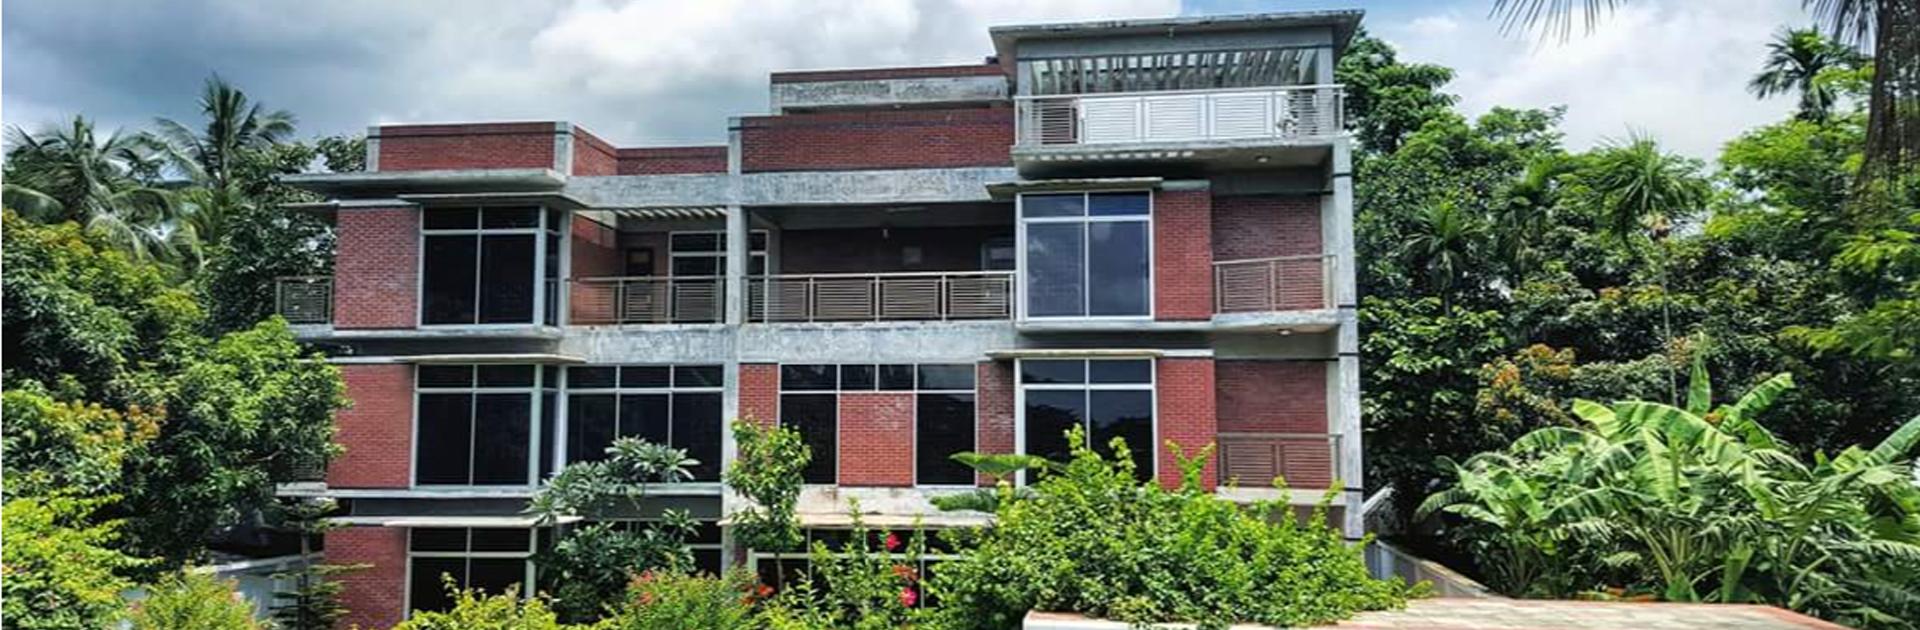 Welcome to<br />Rahmania Housing Development Ltd.